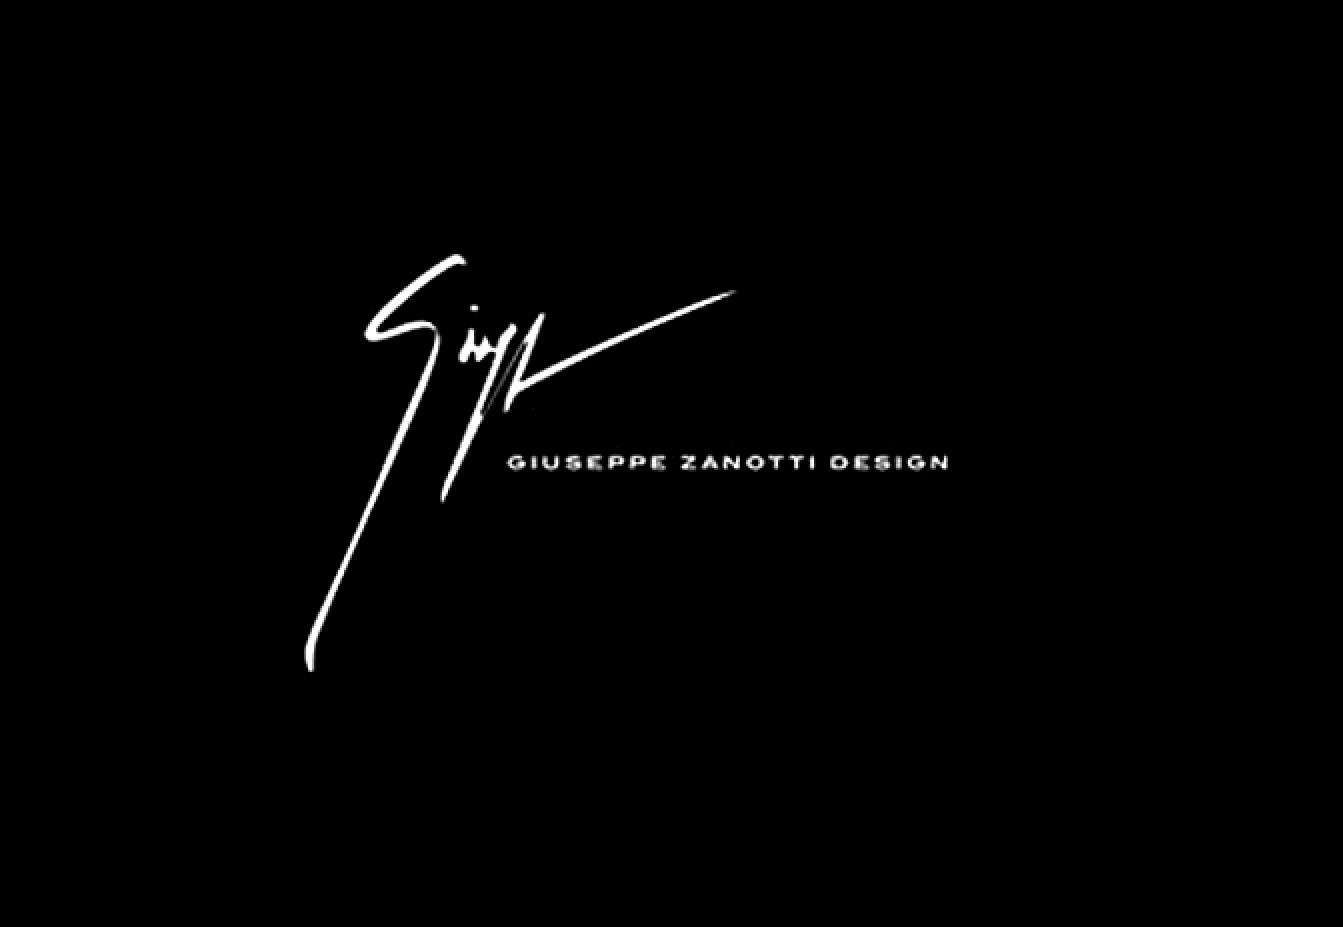 Giuseppe zanotti logo clipart jpg freeuse stock Giuseppe zanotti Logos jpg freeuse stock